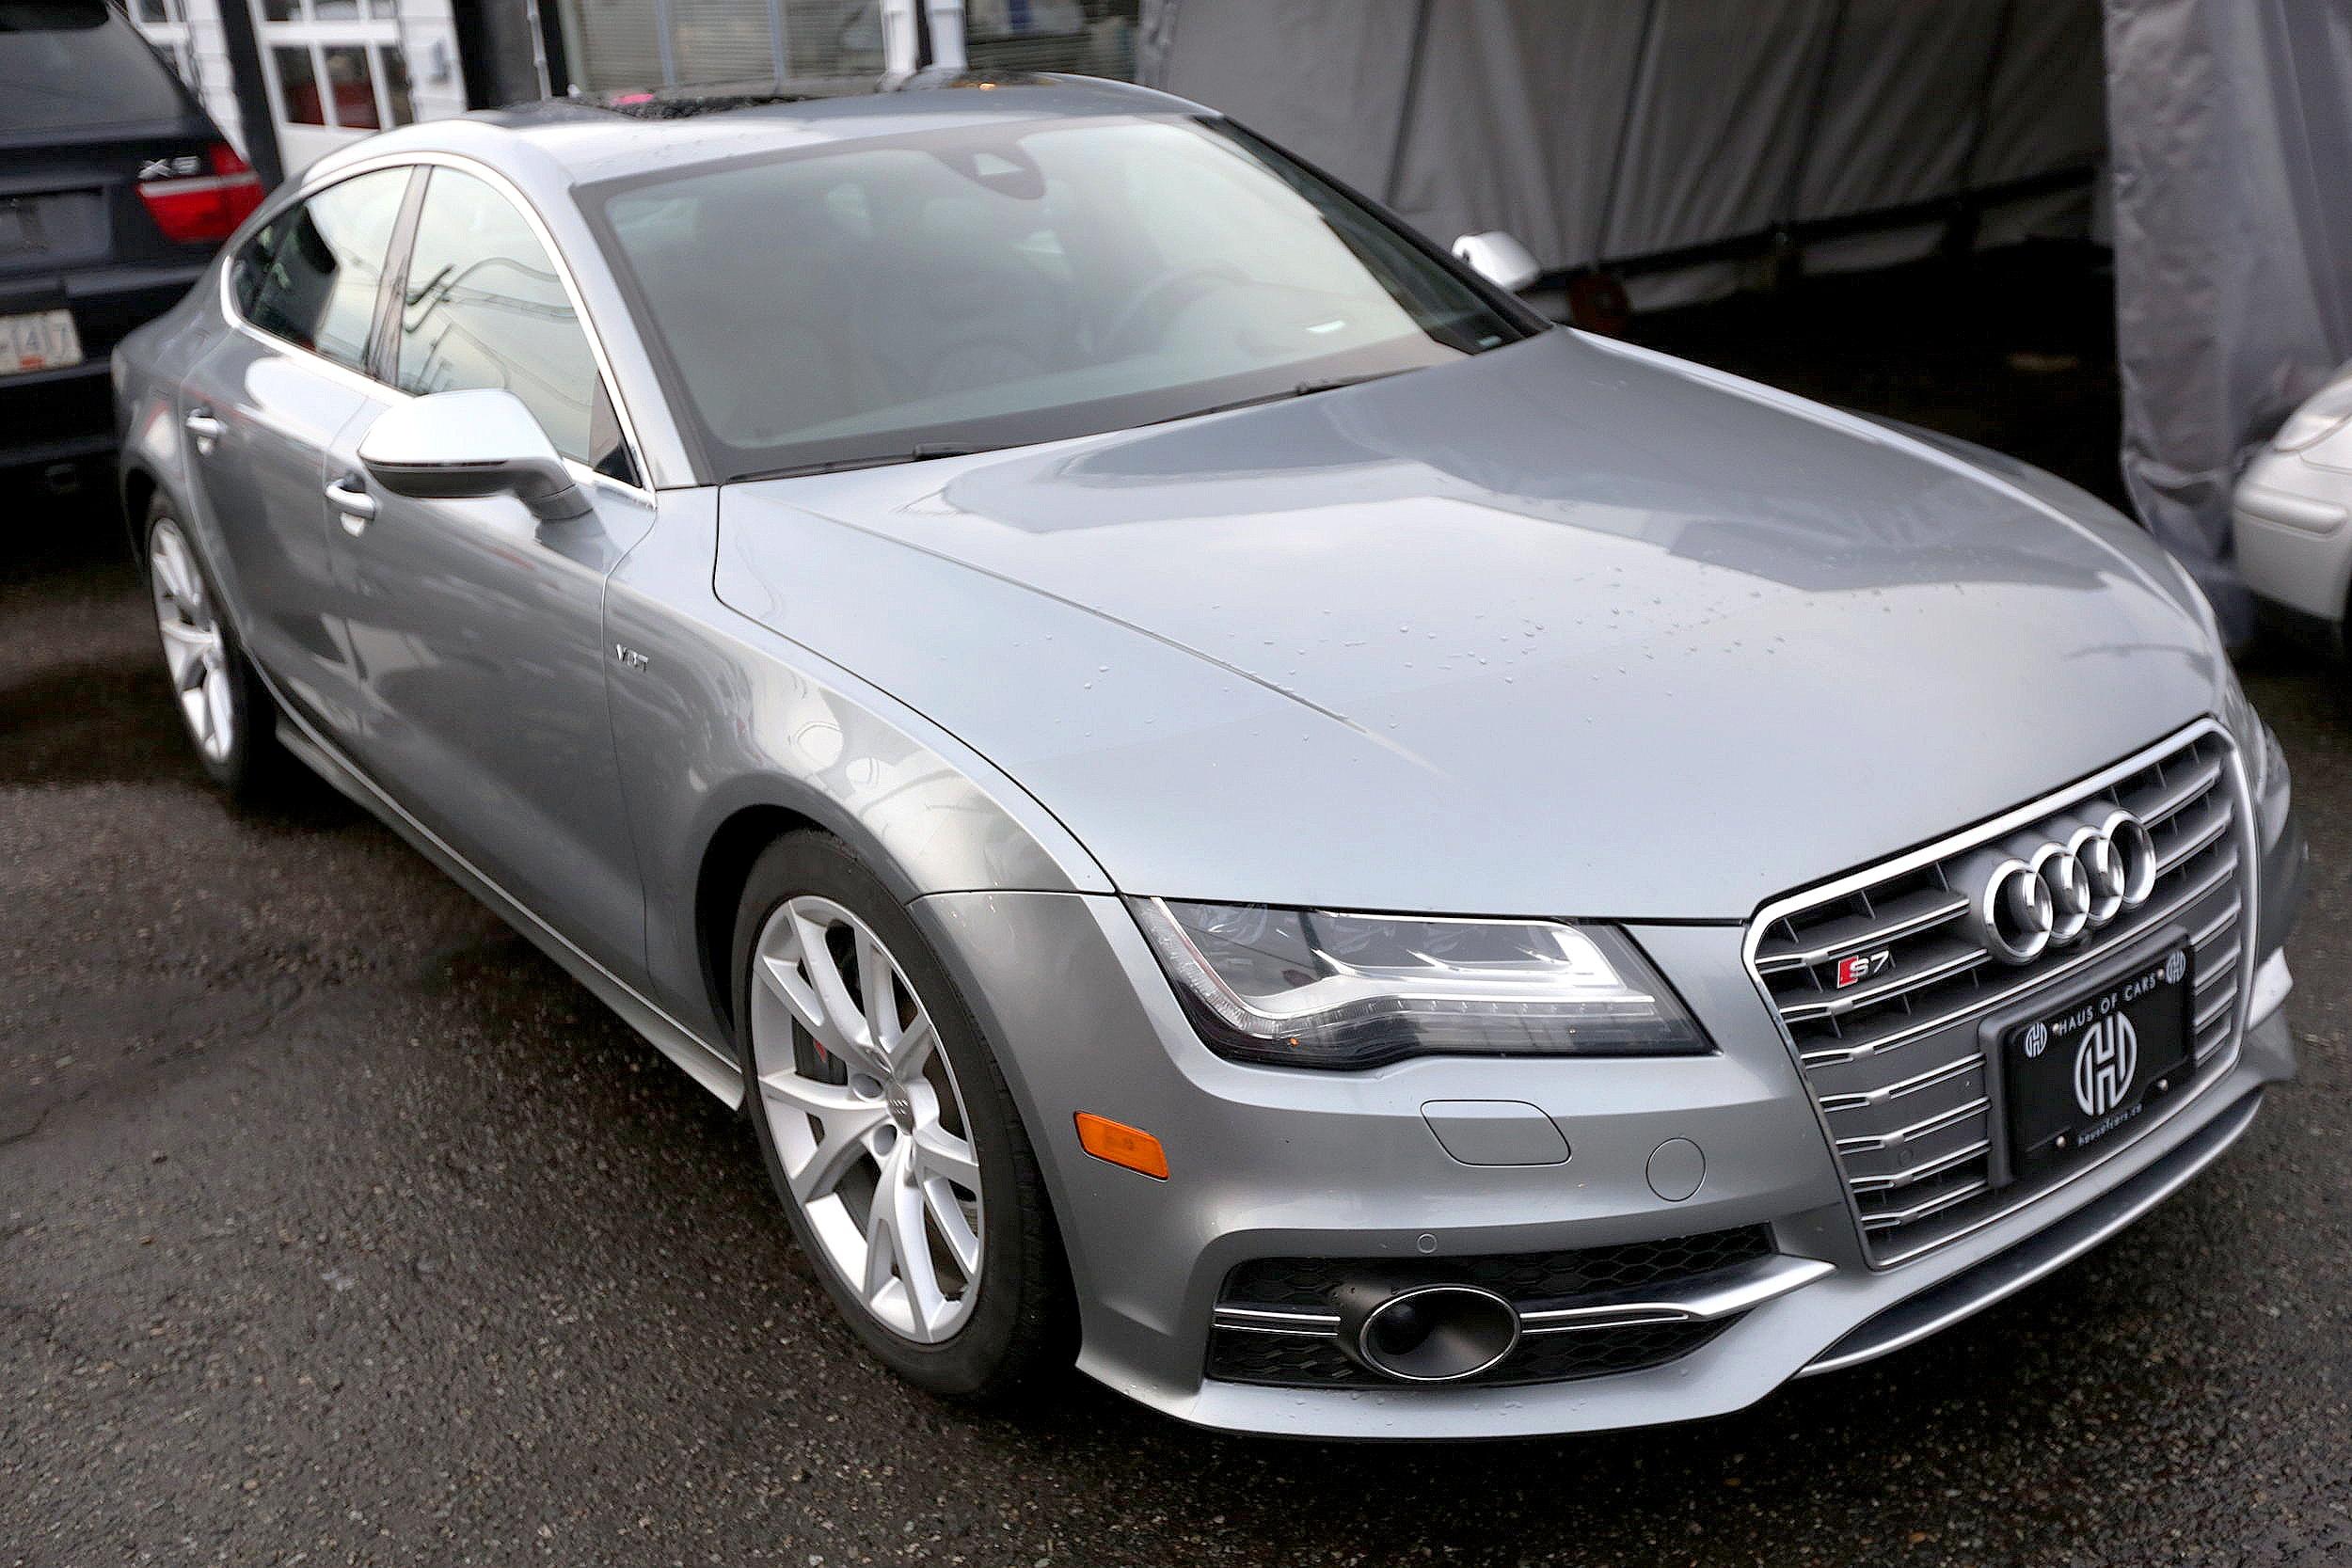 2013 Audi s7, full load -